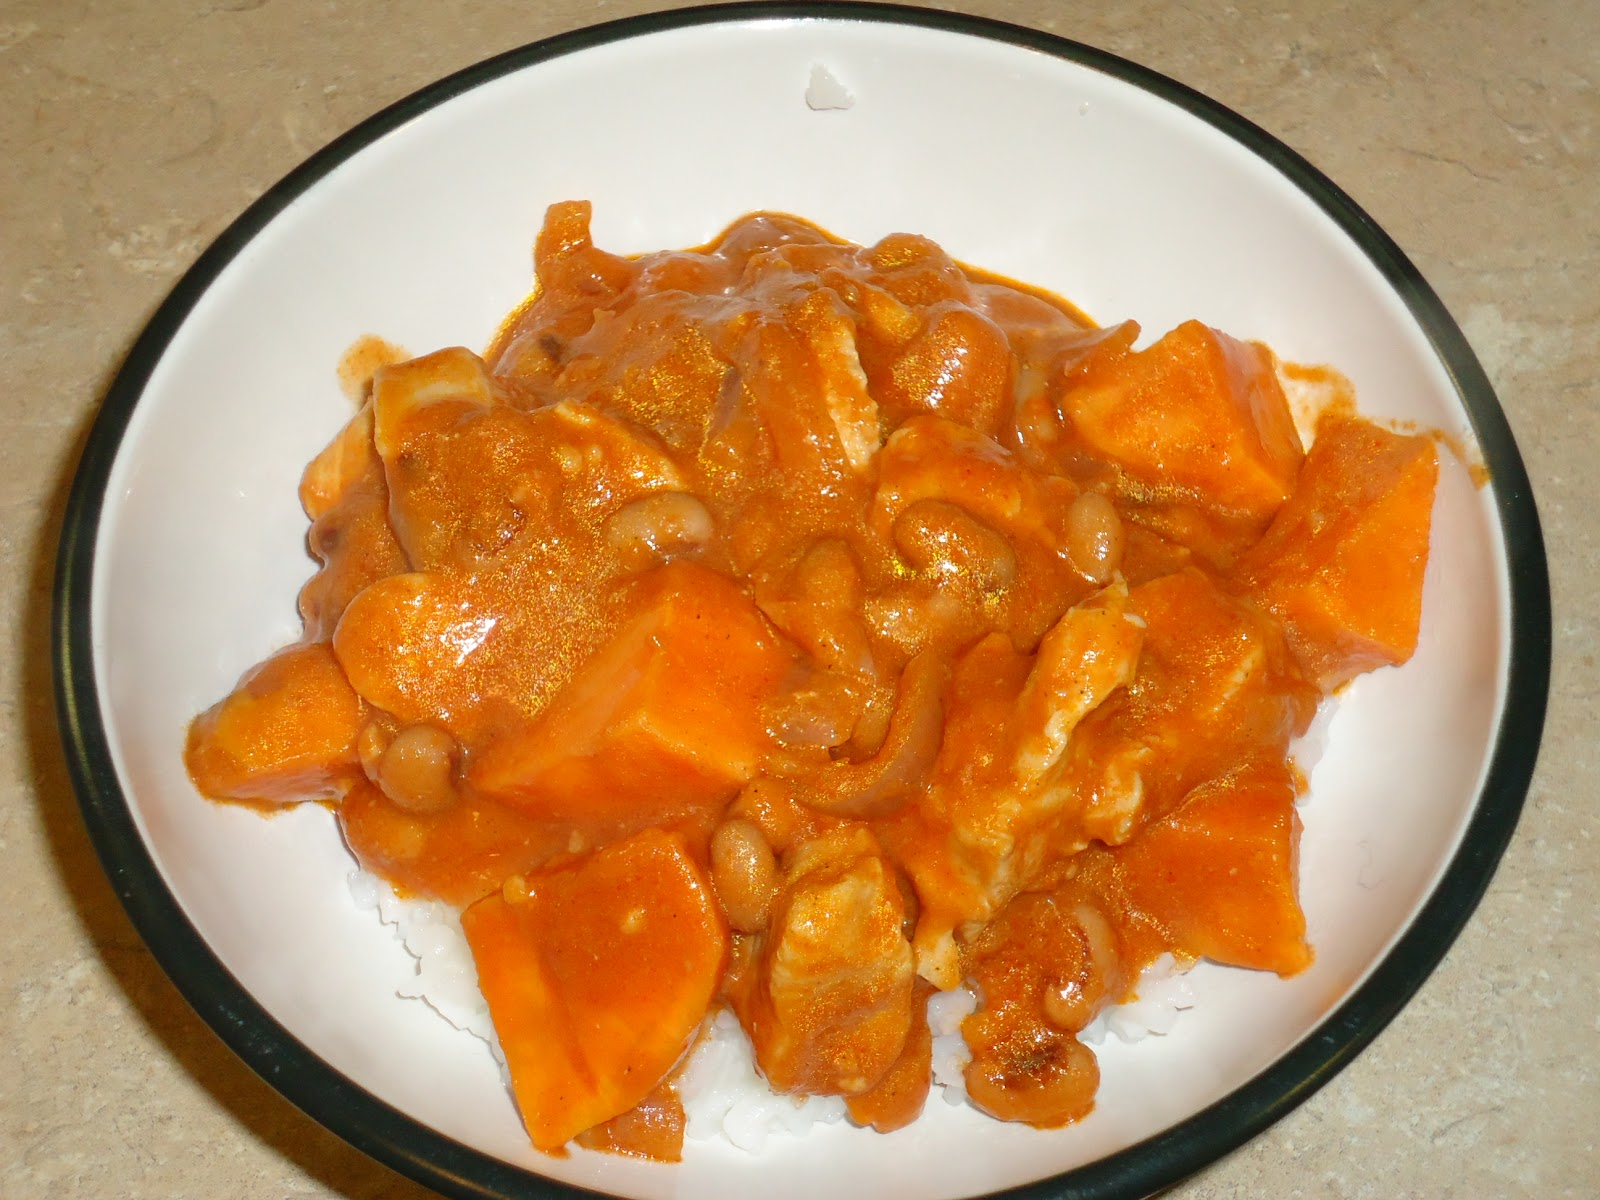 Meals With Meredith*: West African Chicken Stew